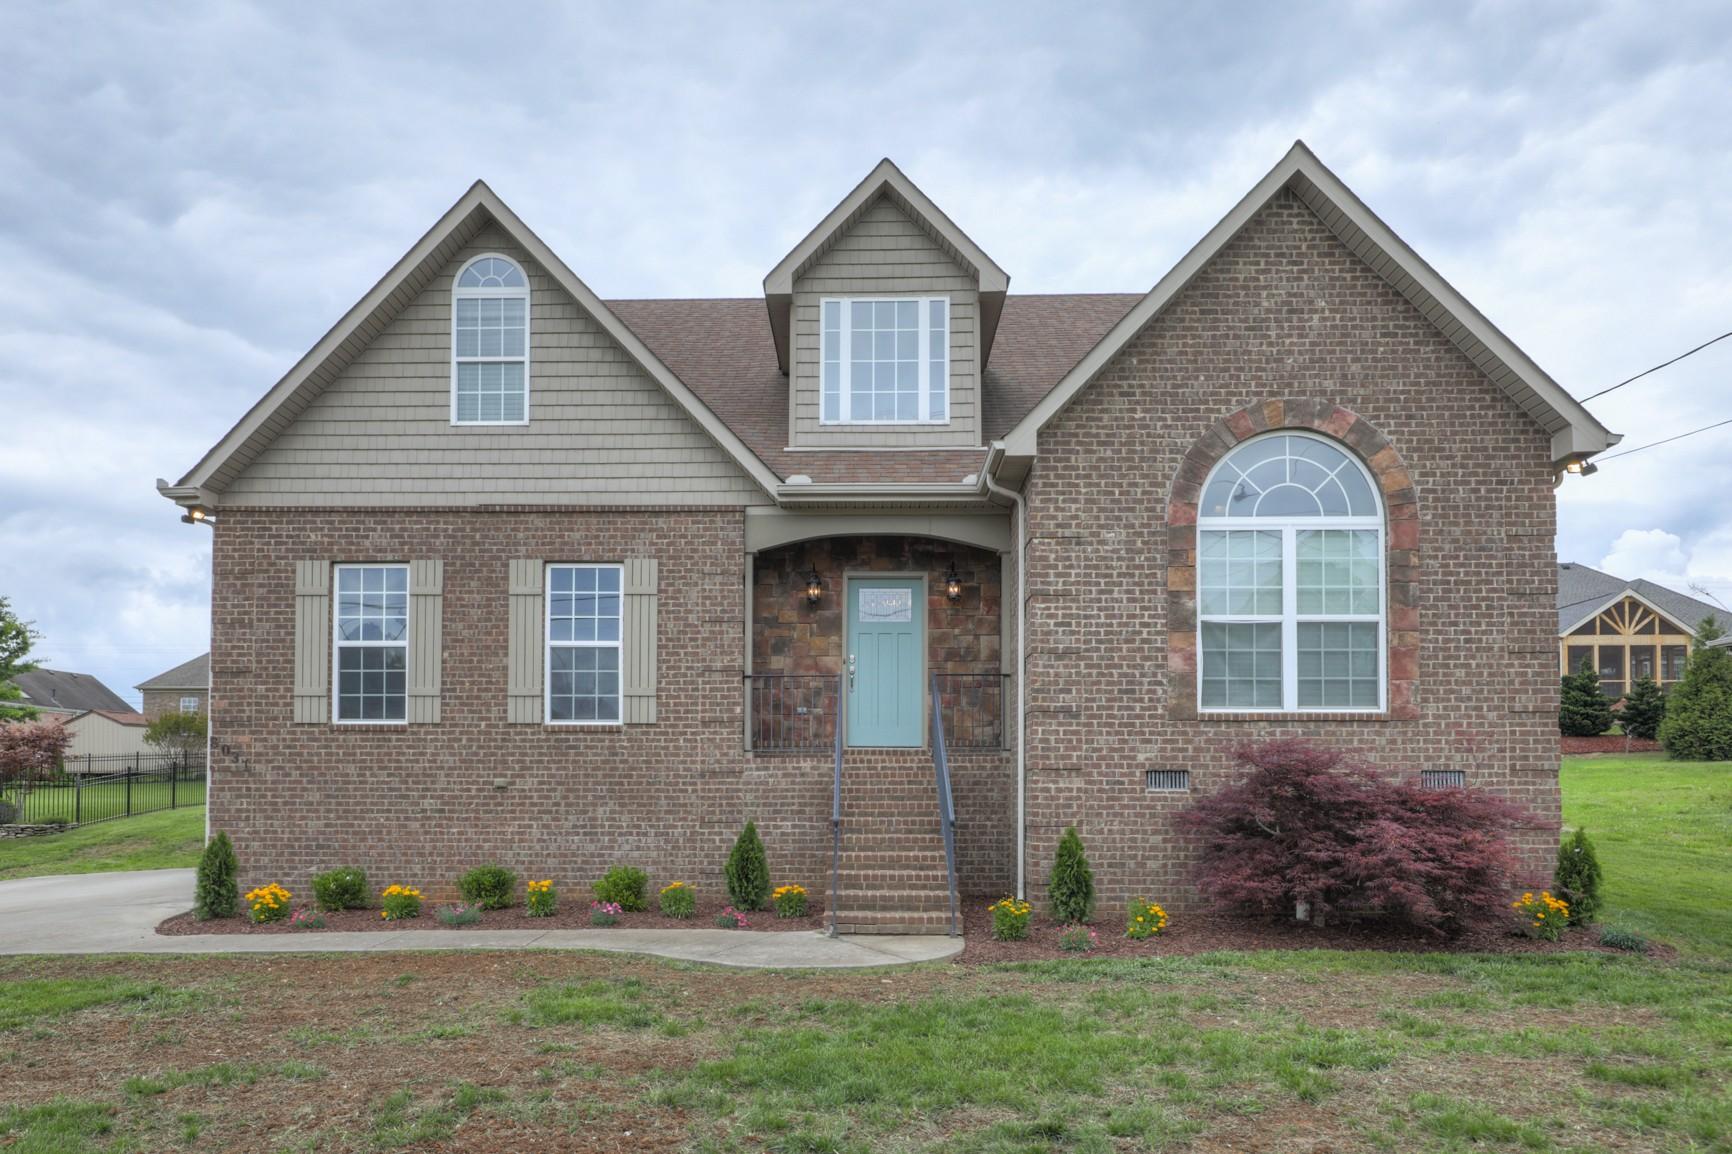 8031 Vineyard Ln, LA VERGNE, TN 37086 - LA VERGNE, TN real estate listing